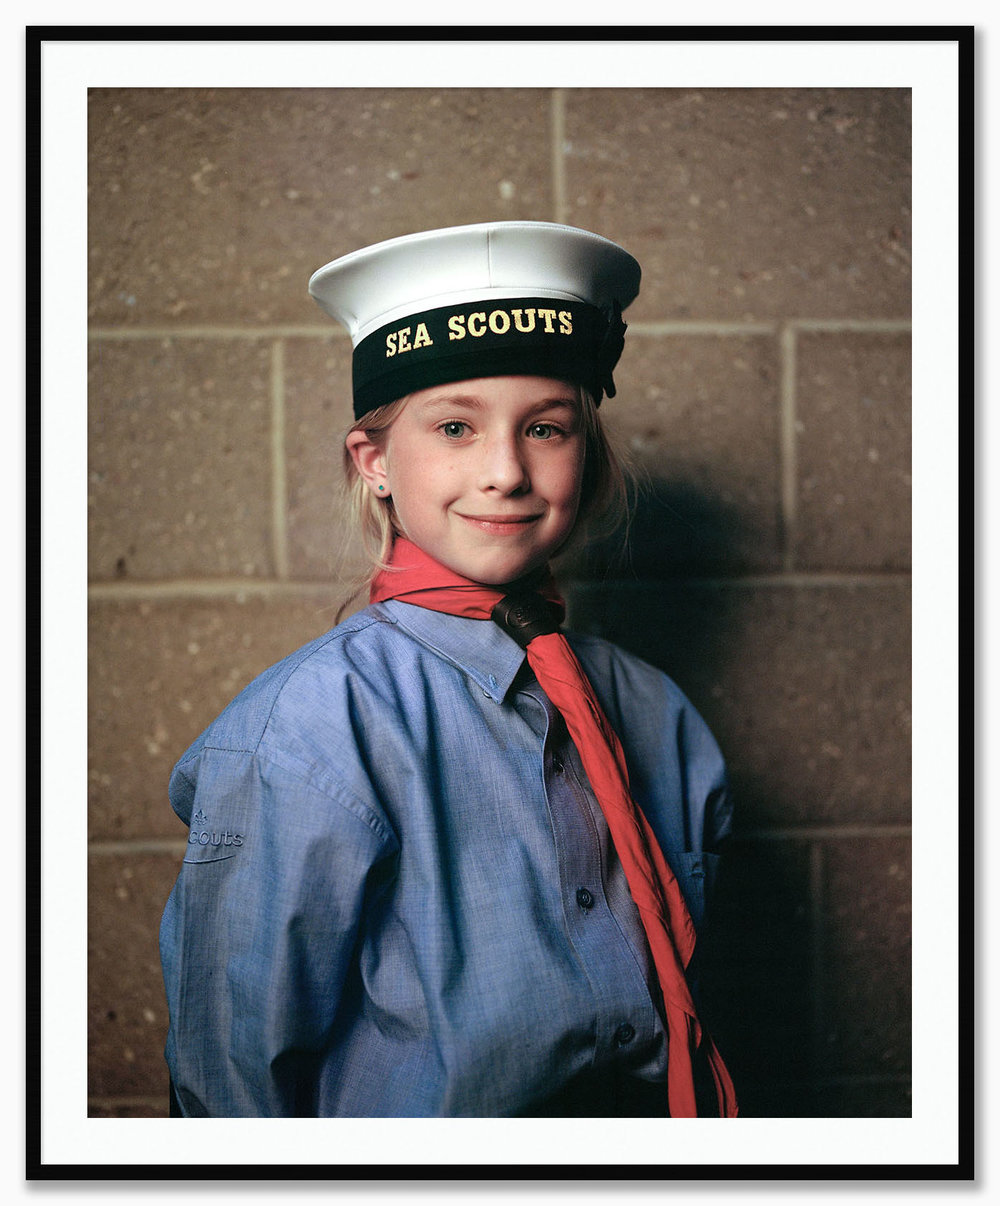 Untitled I. Sea Scout. England. Izzy de Wattripont_Mat_MatteBlack.jpg